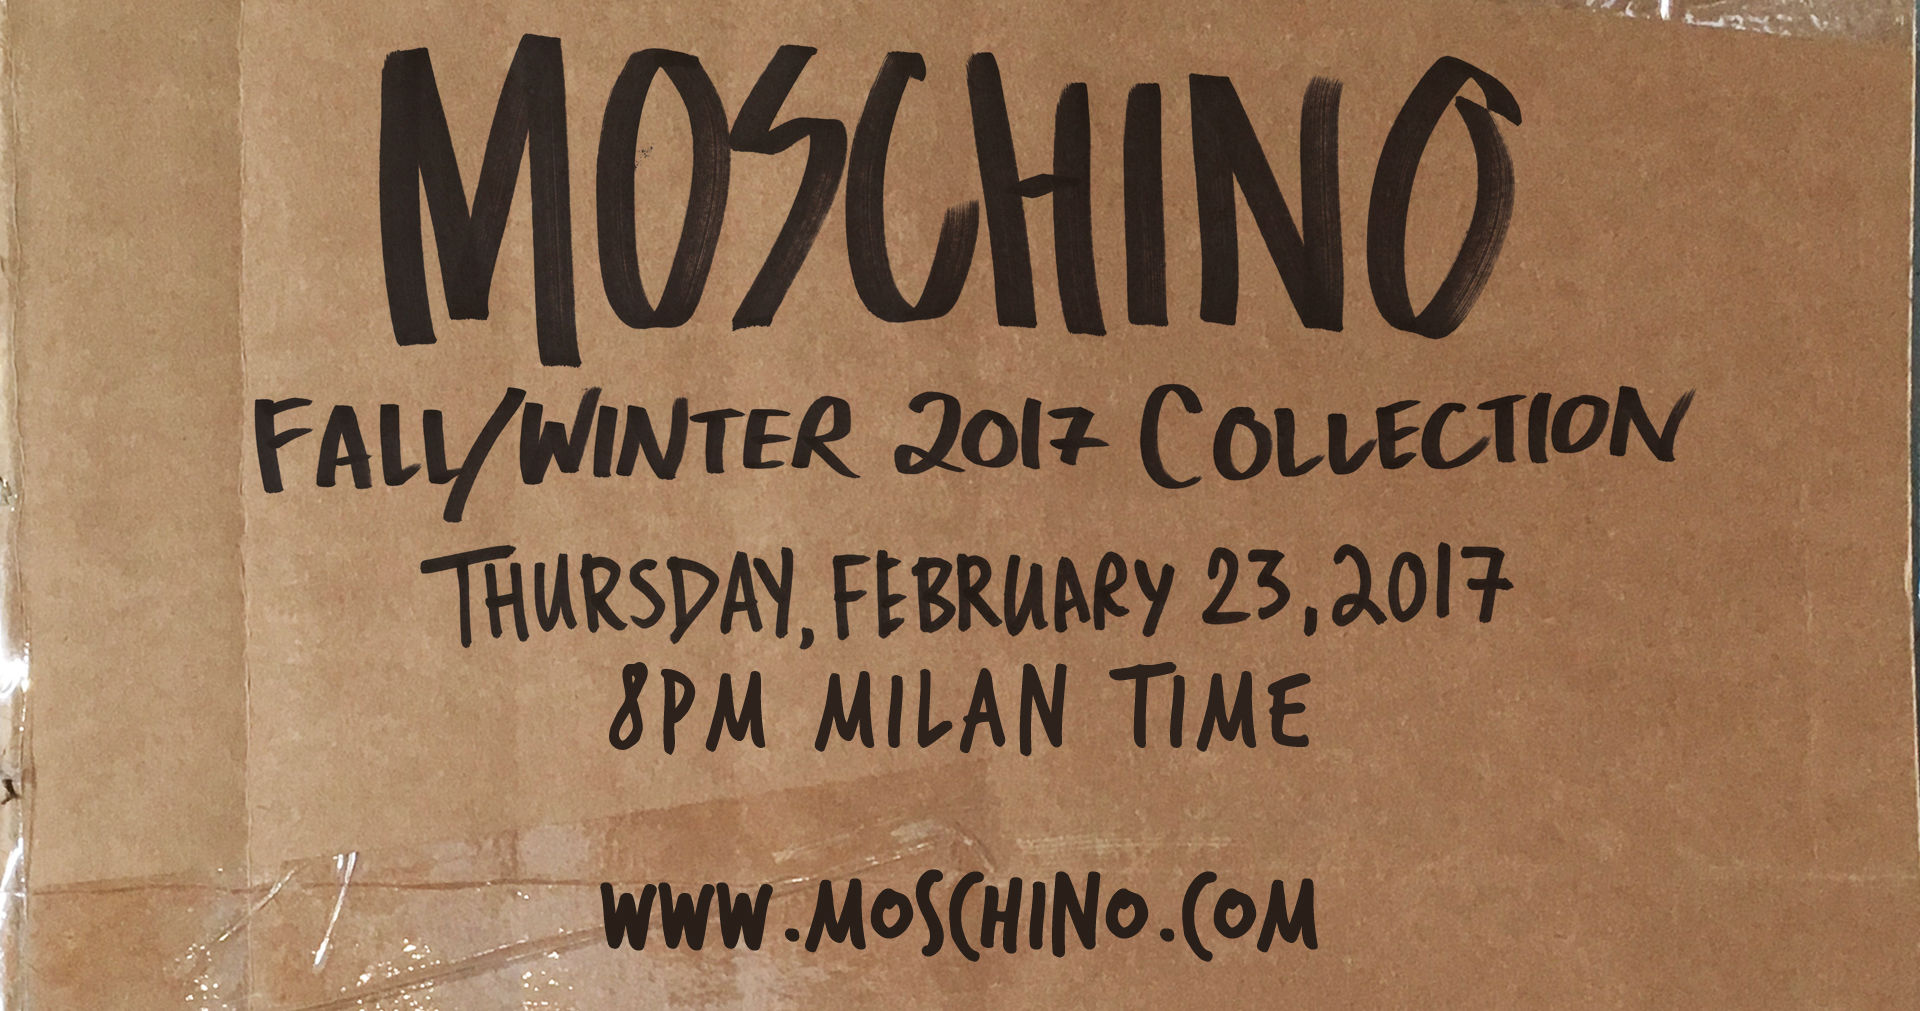 Moschino Fall Winter 2017-18 Fashion Show Live Streaming